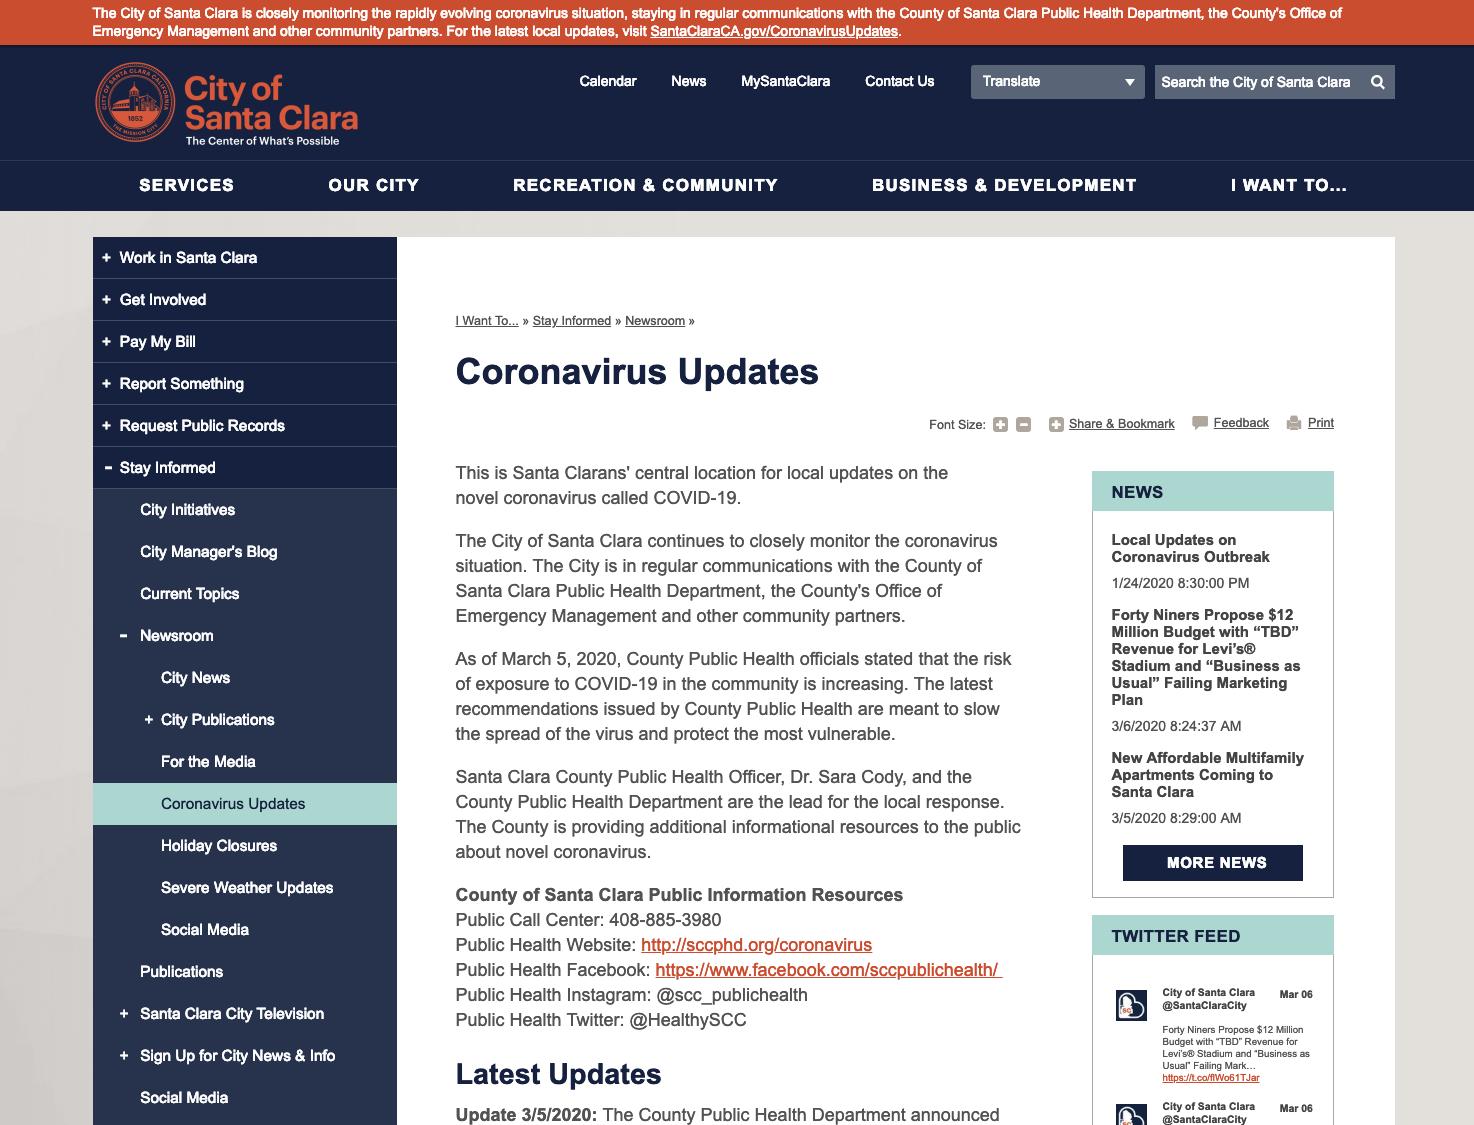 COVID:19 webpage update for City of Santa Clara, California